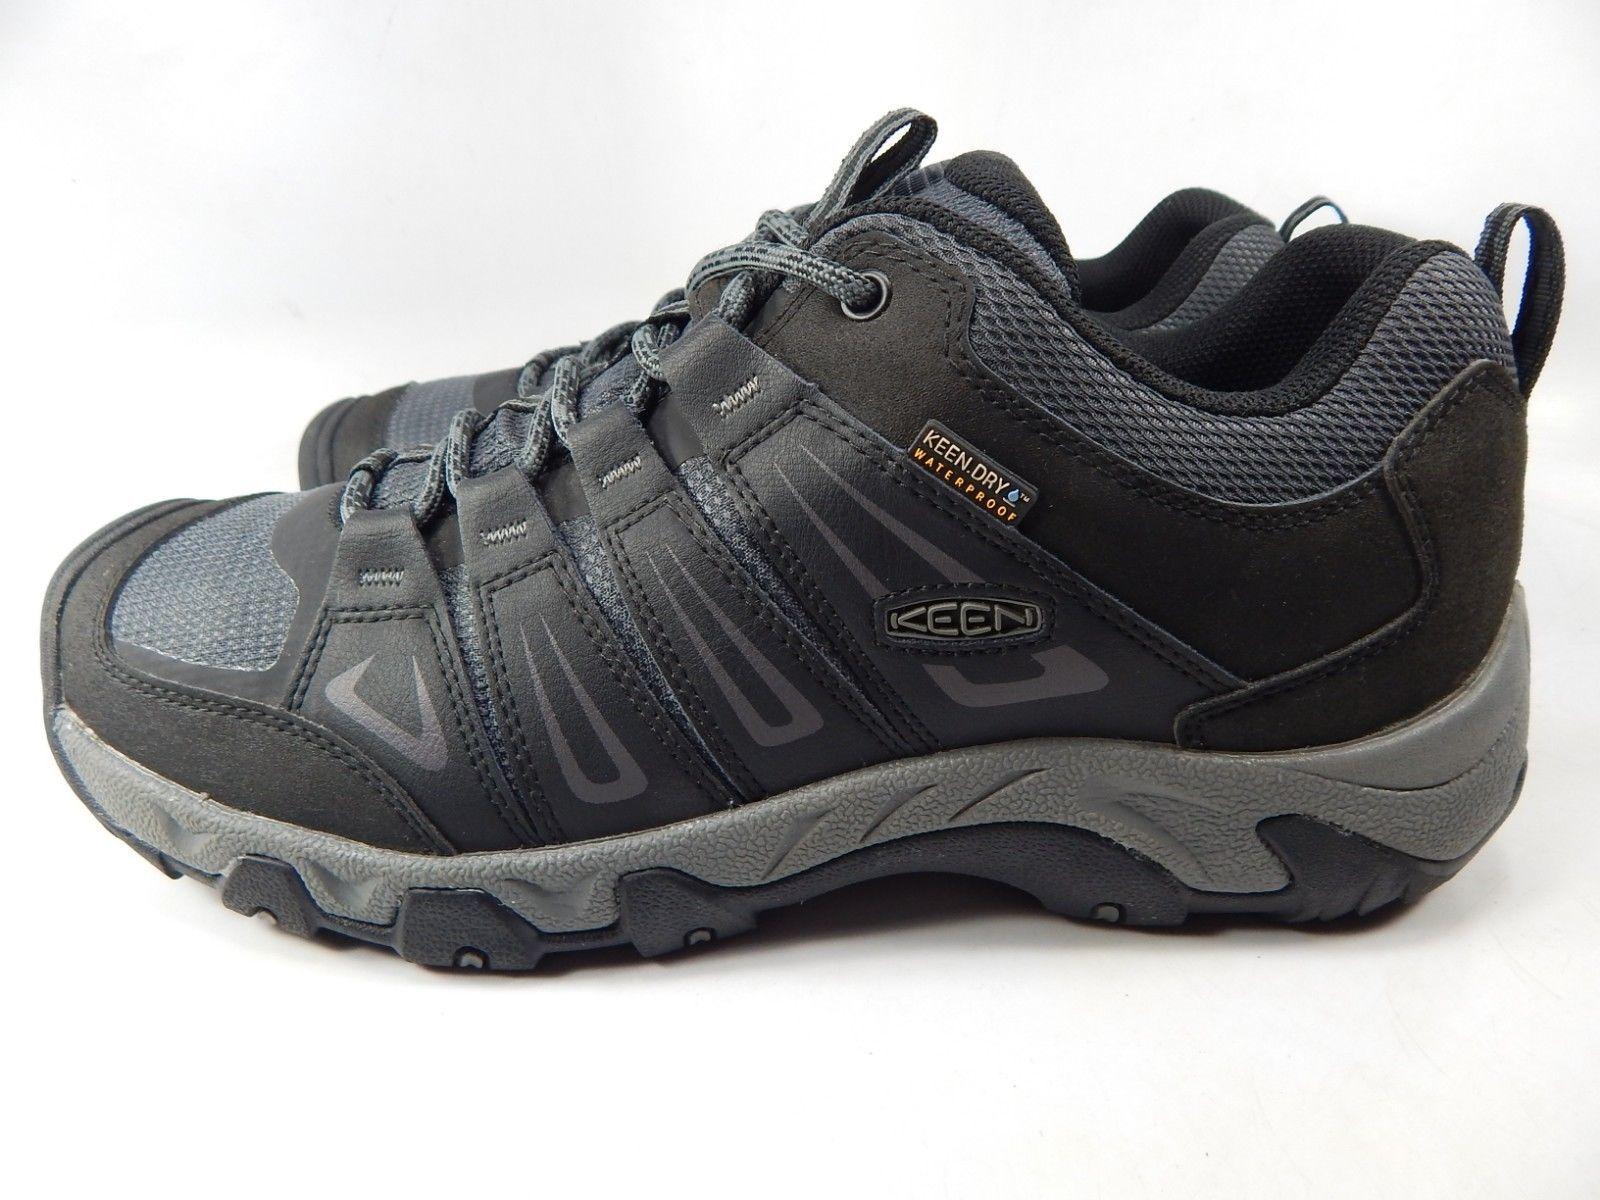 Keen Oakridge Size US 11 M (D) EU 44.5 Men's WP Trail Hiking Shoes Gray 1015313